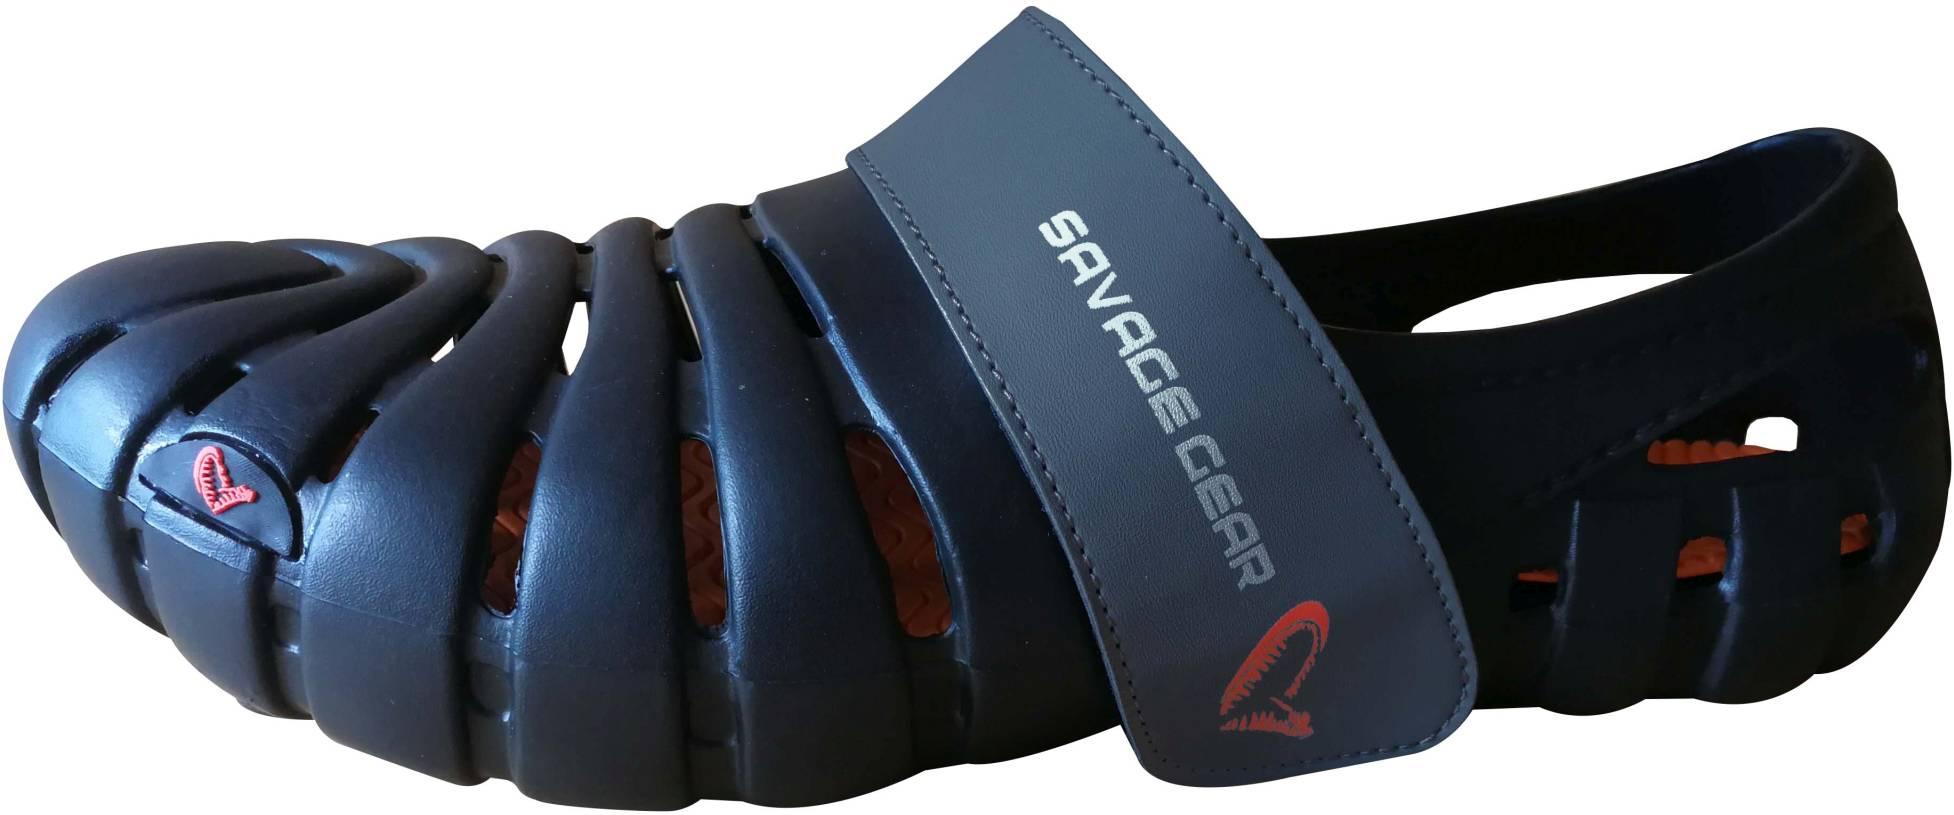 Savage Gear CoolFit Shoe